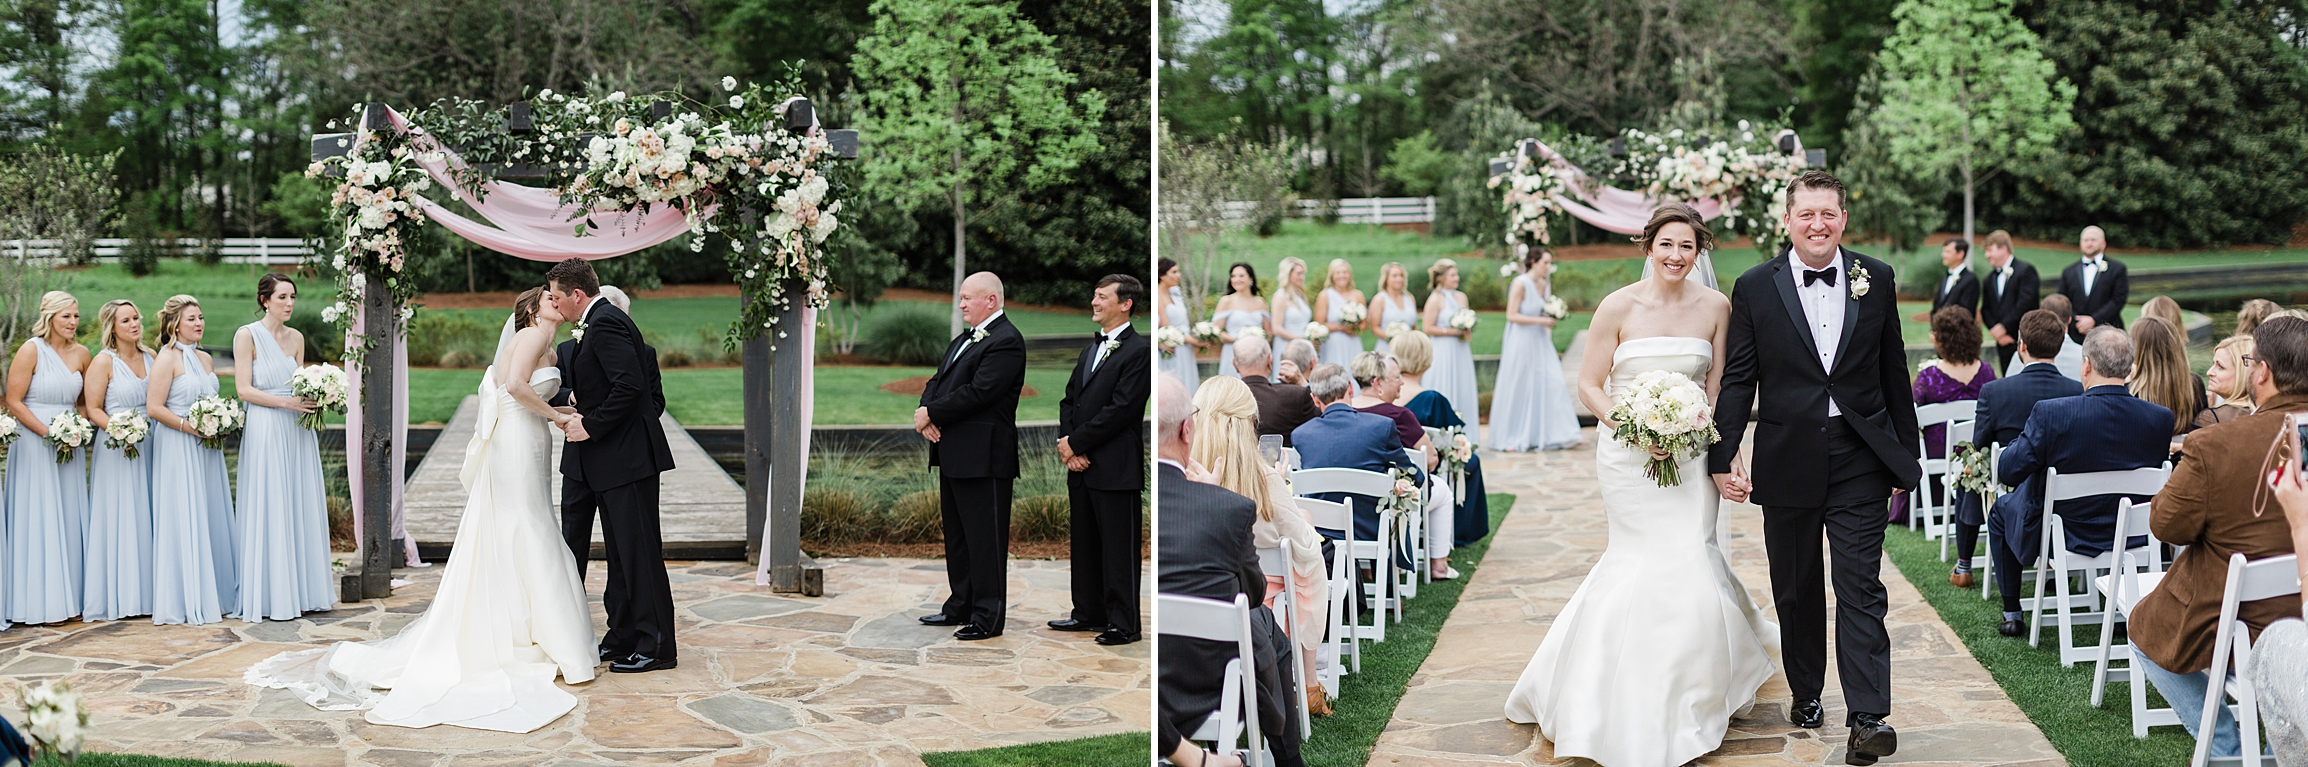 Alabama Wedding Potographer_0052.jpg